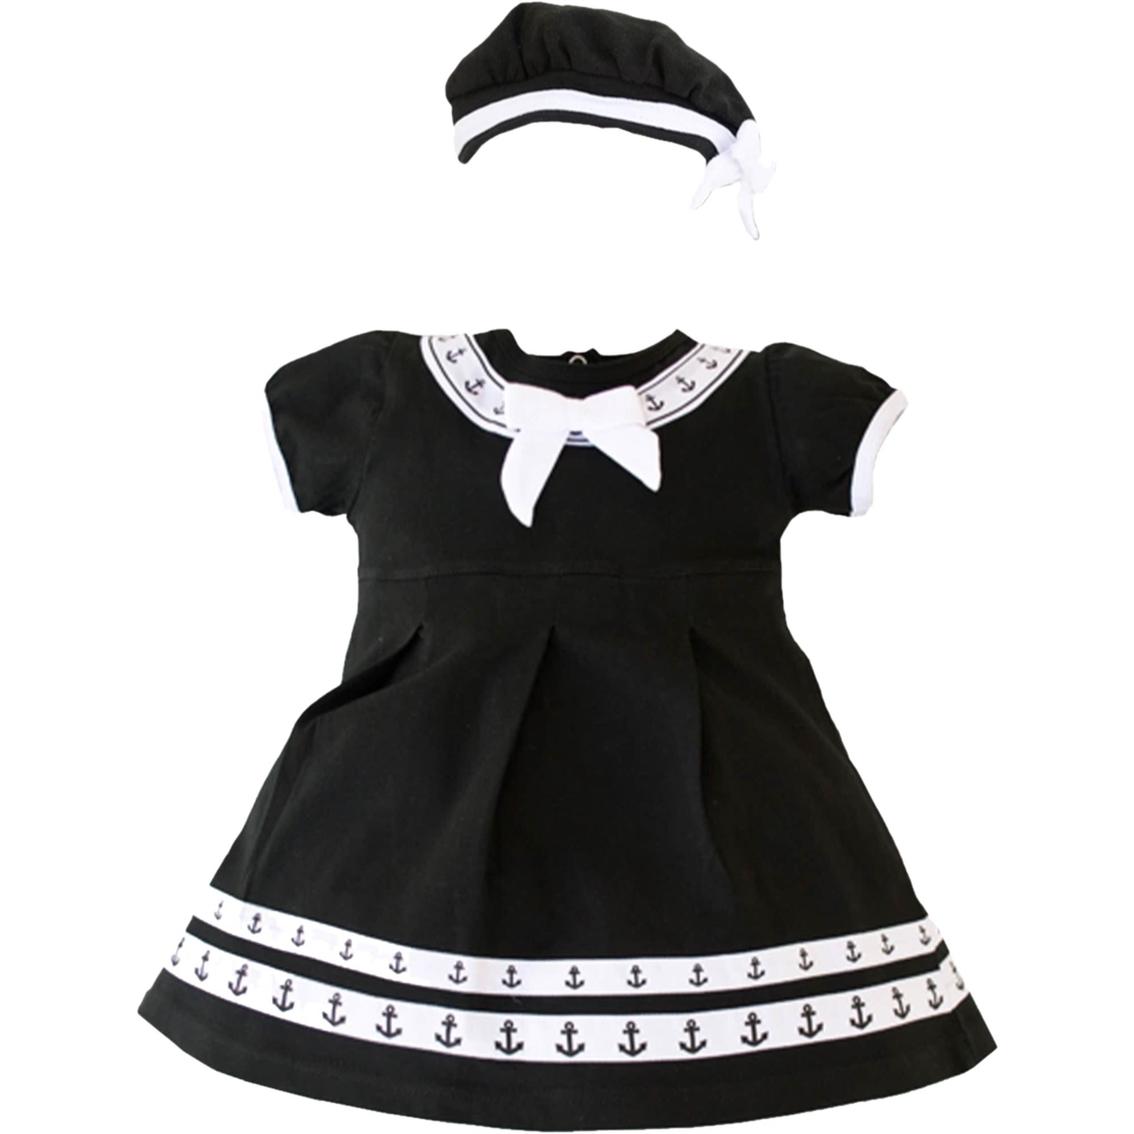 eae320642612 Trooper Clothing Infant Girls Sailor Dress With Beret